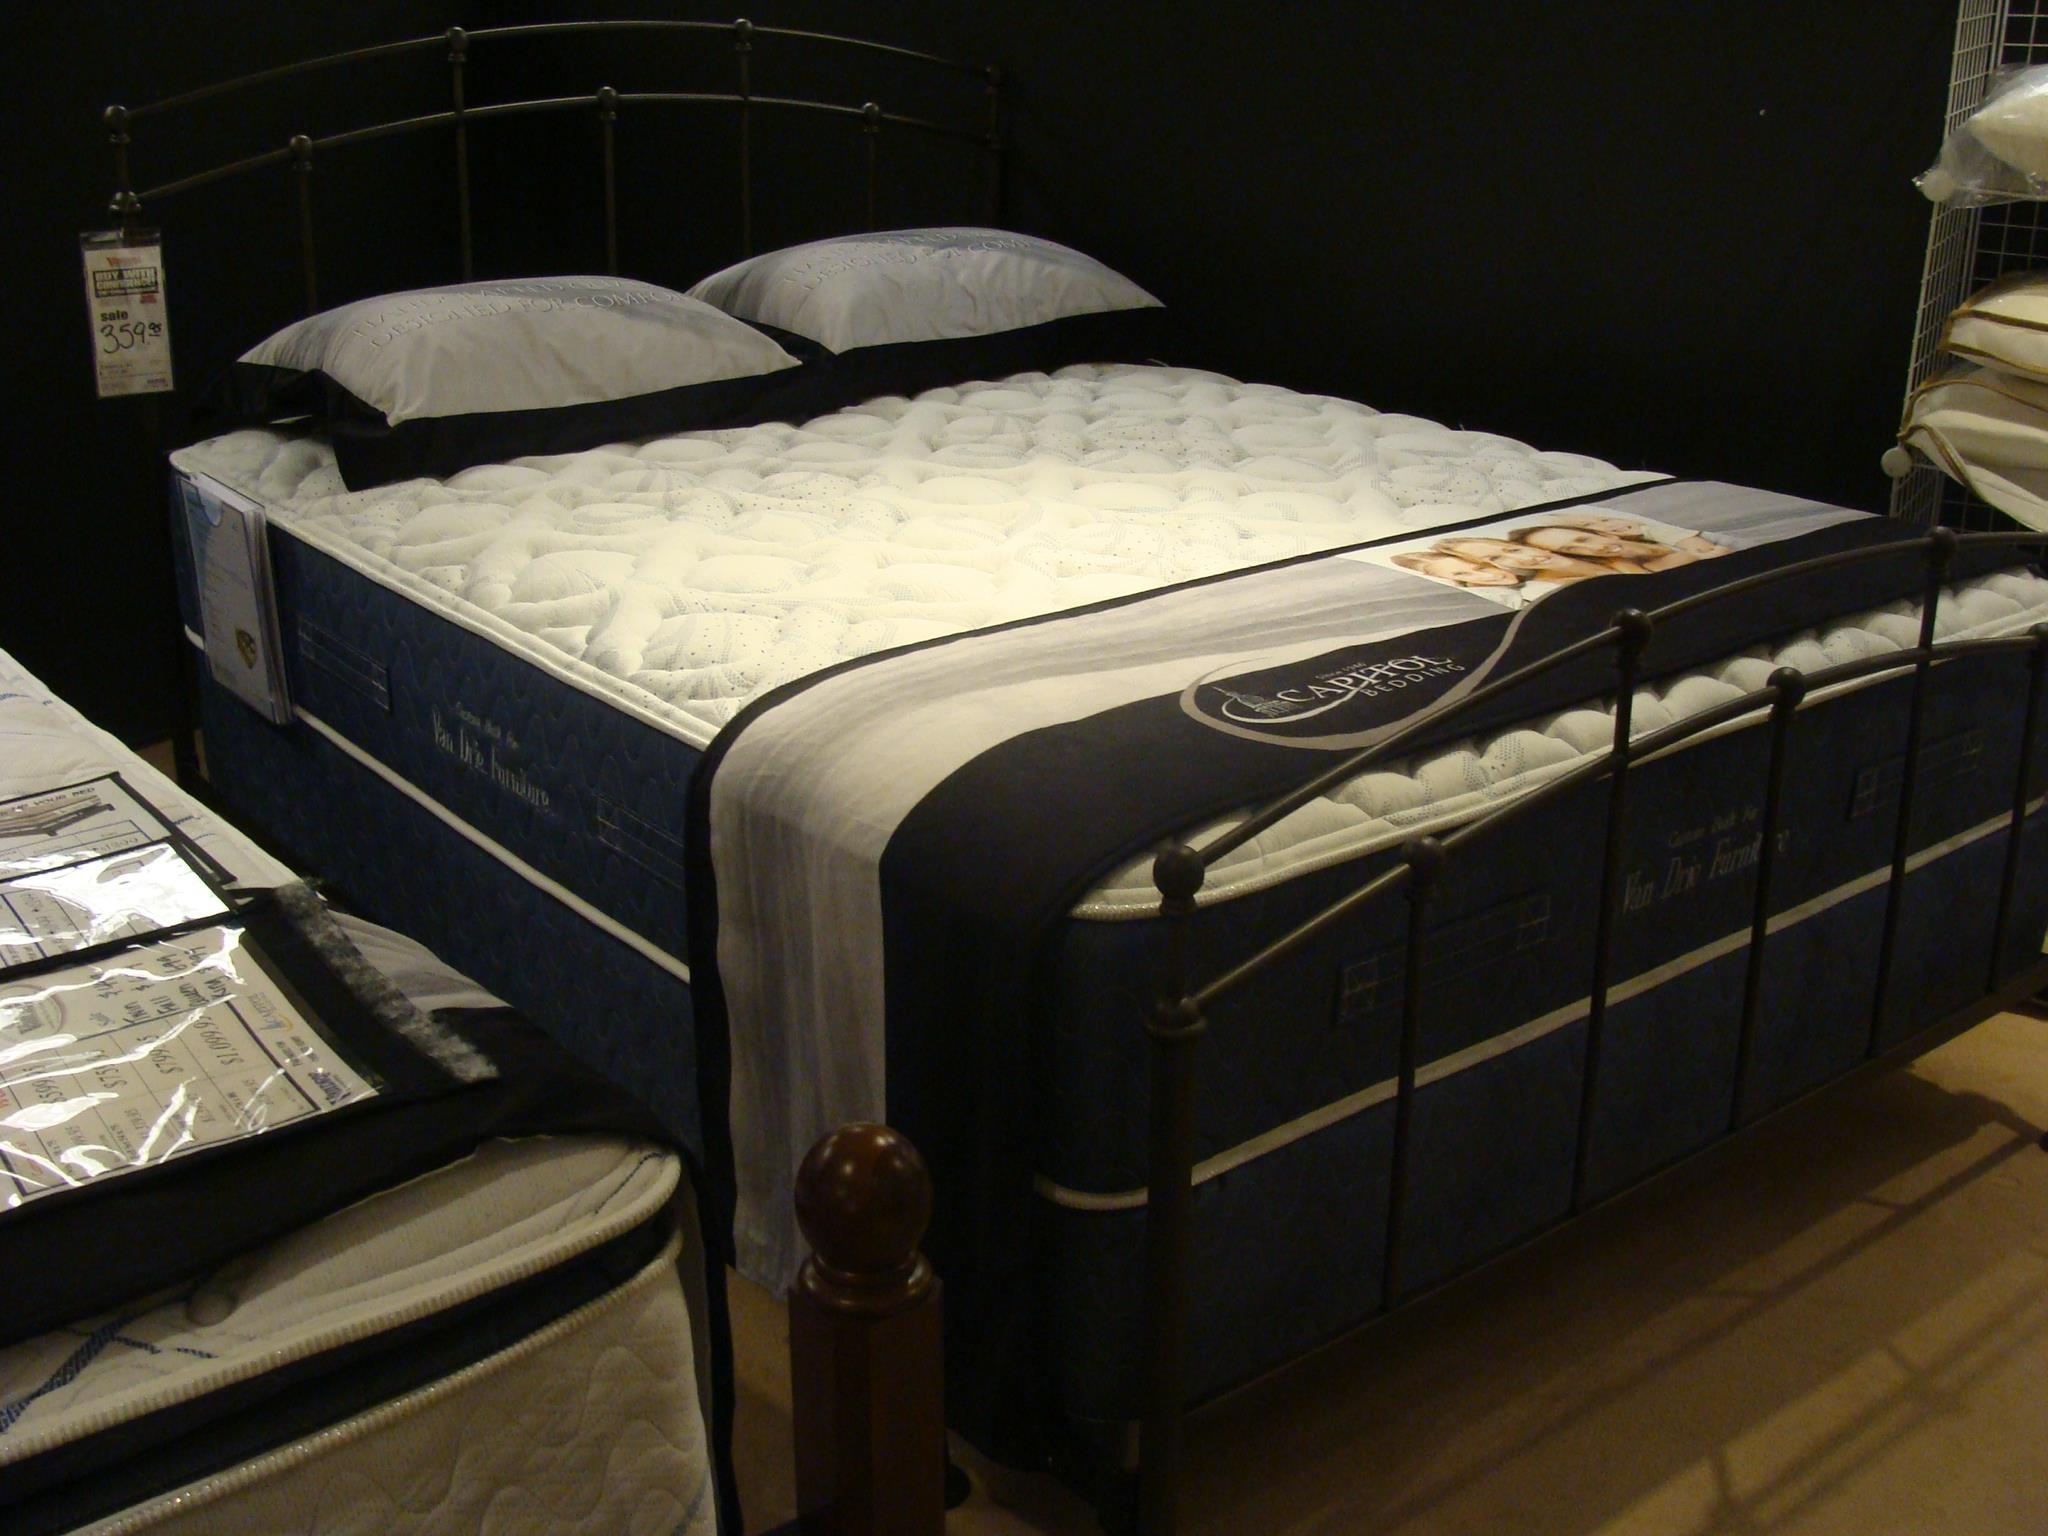 Capitol Bedding Melbourne Firm Queen Innerspring Mattress Set - Item Number: Innerspring-Q+HMI-Q